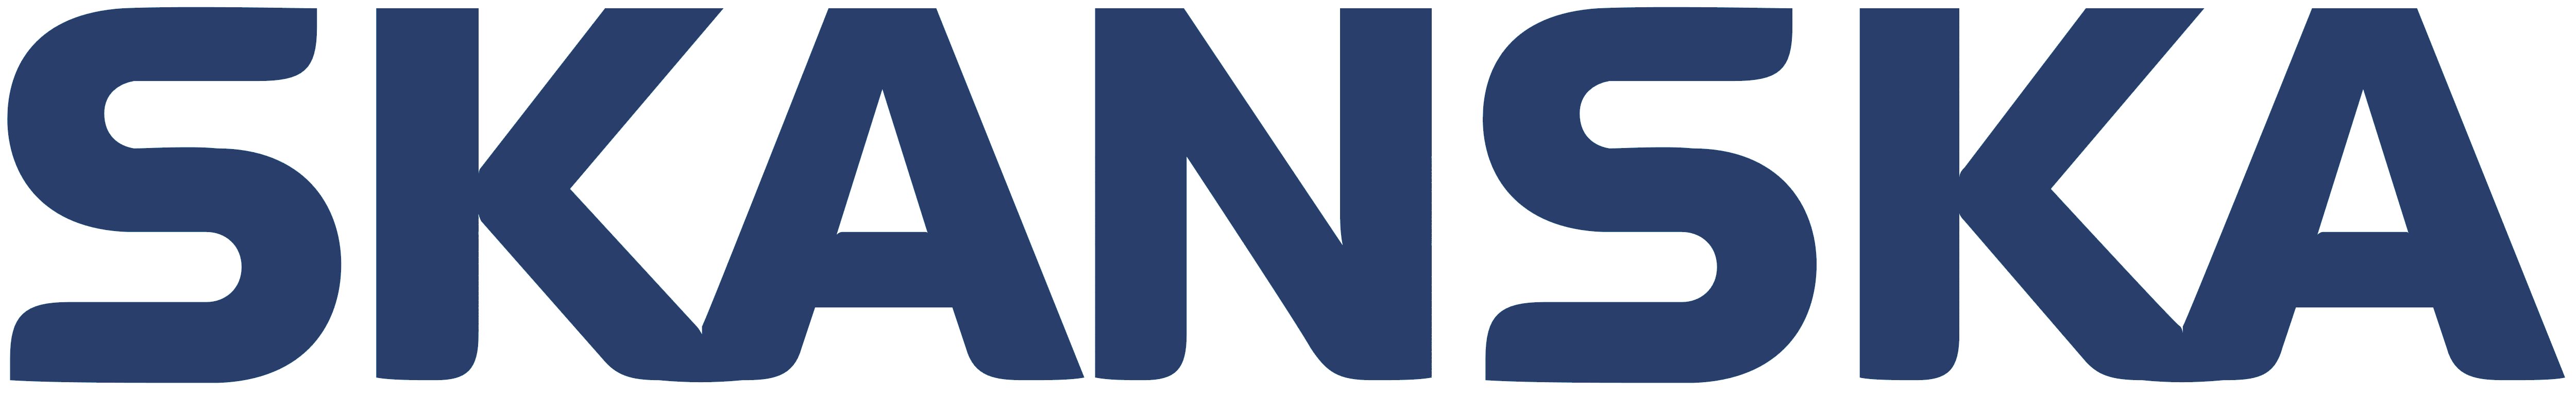 Skanska logo giosg customer story